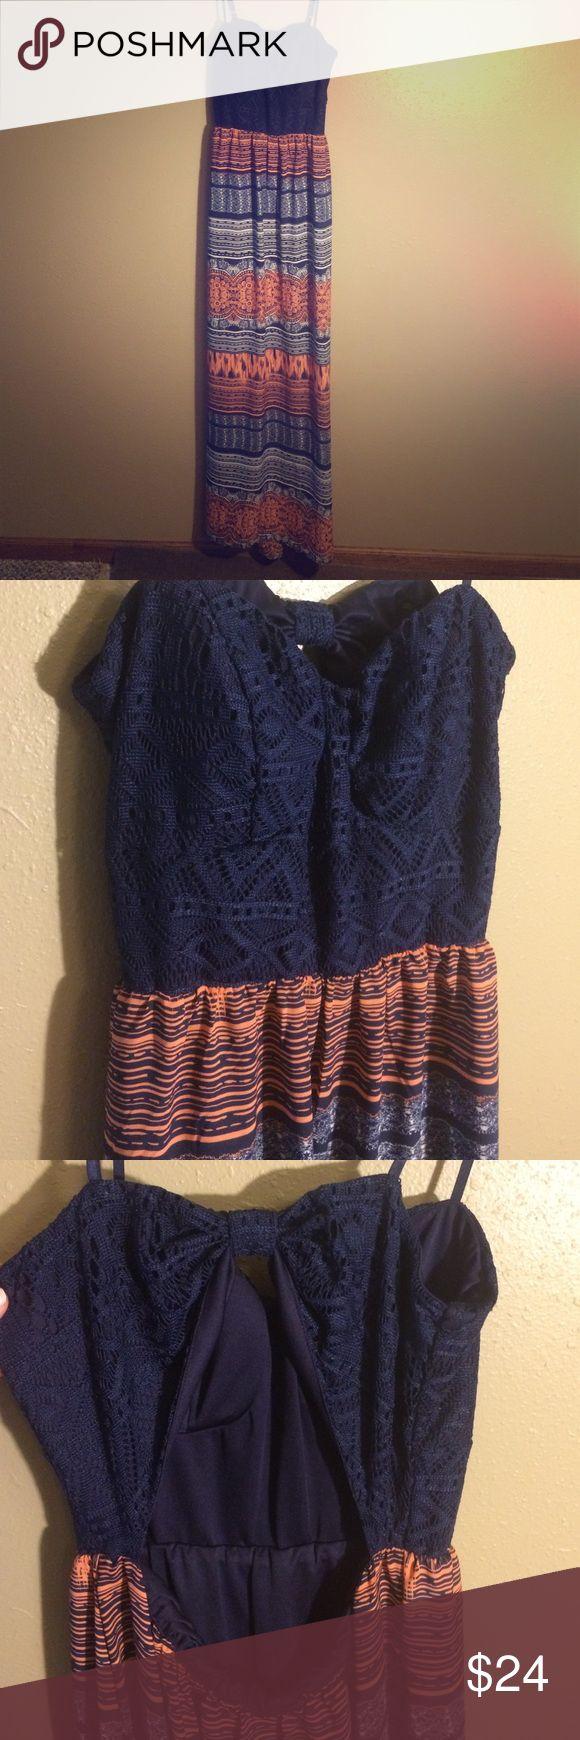 Navy blue chiffon Aztec maxi dress Navy blue chiffon Aztec maxi dress. Keyhole back. Elastic waist Dresses Maxi